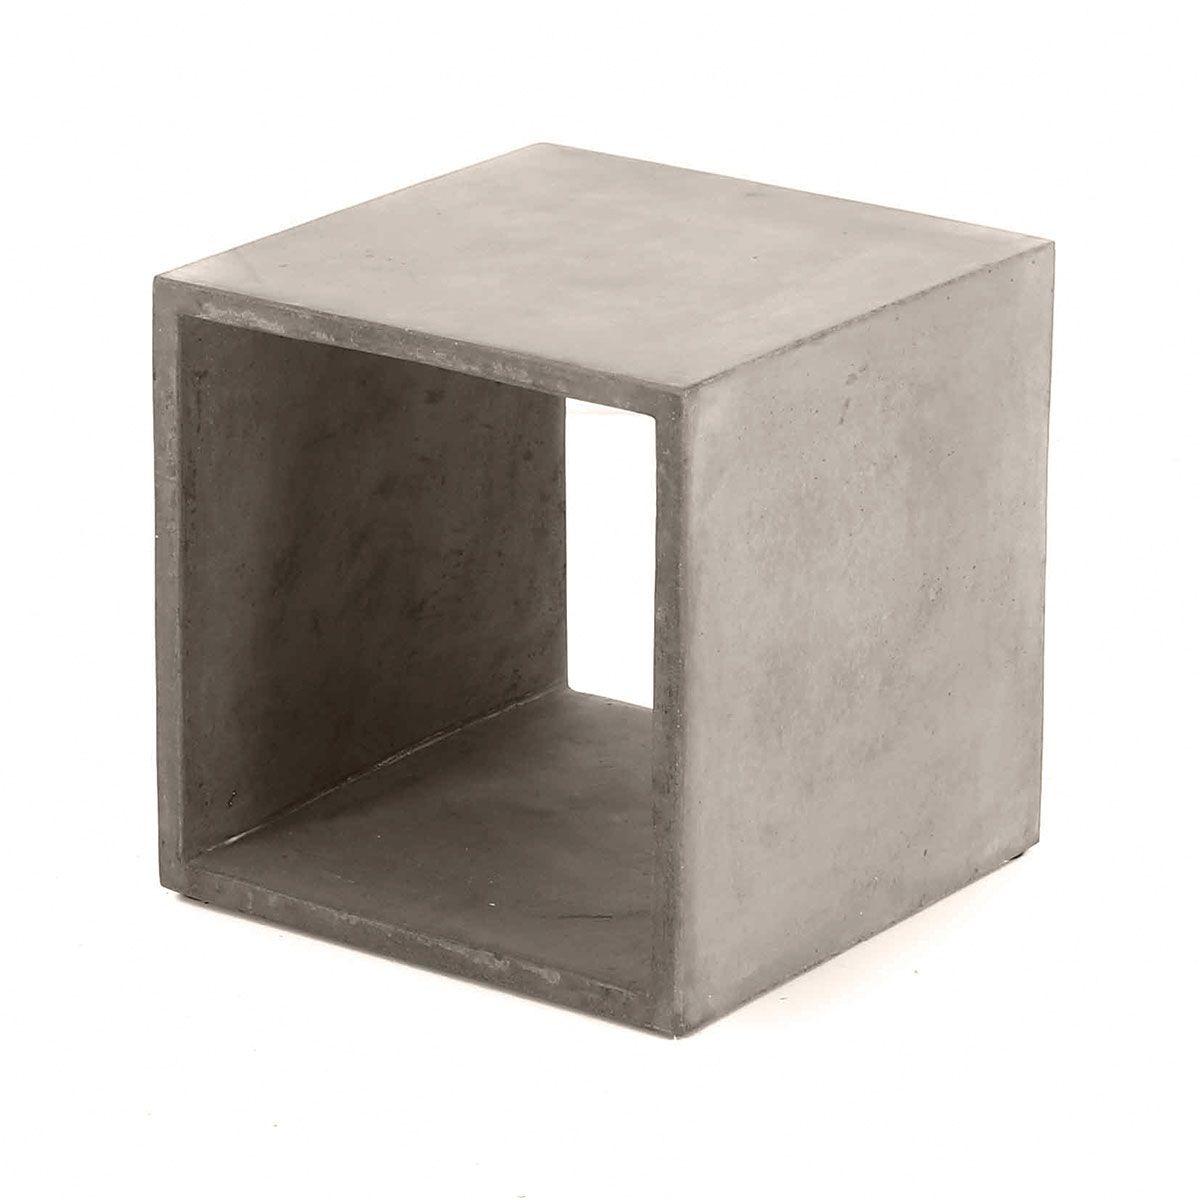 cube rangement b ton style industriel zago store. Black Bedroom Furniture Sets. Home Design Ideas